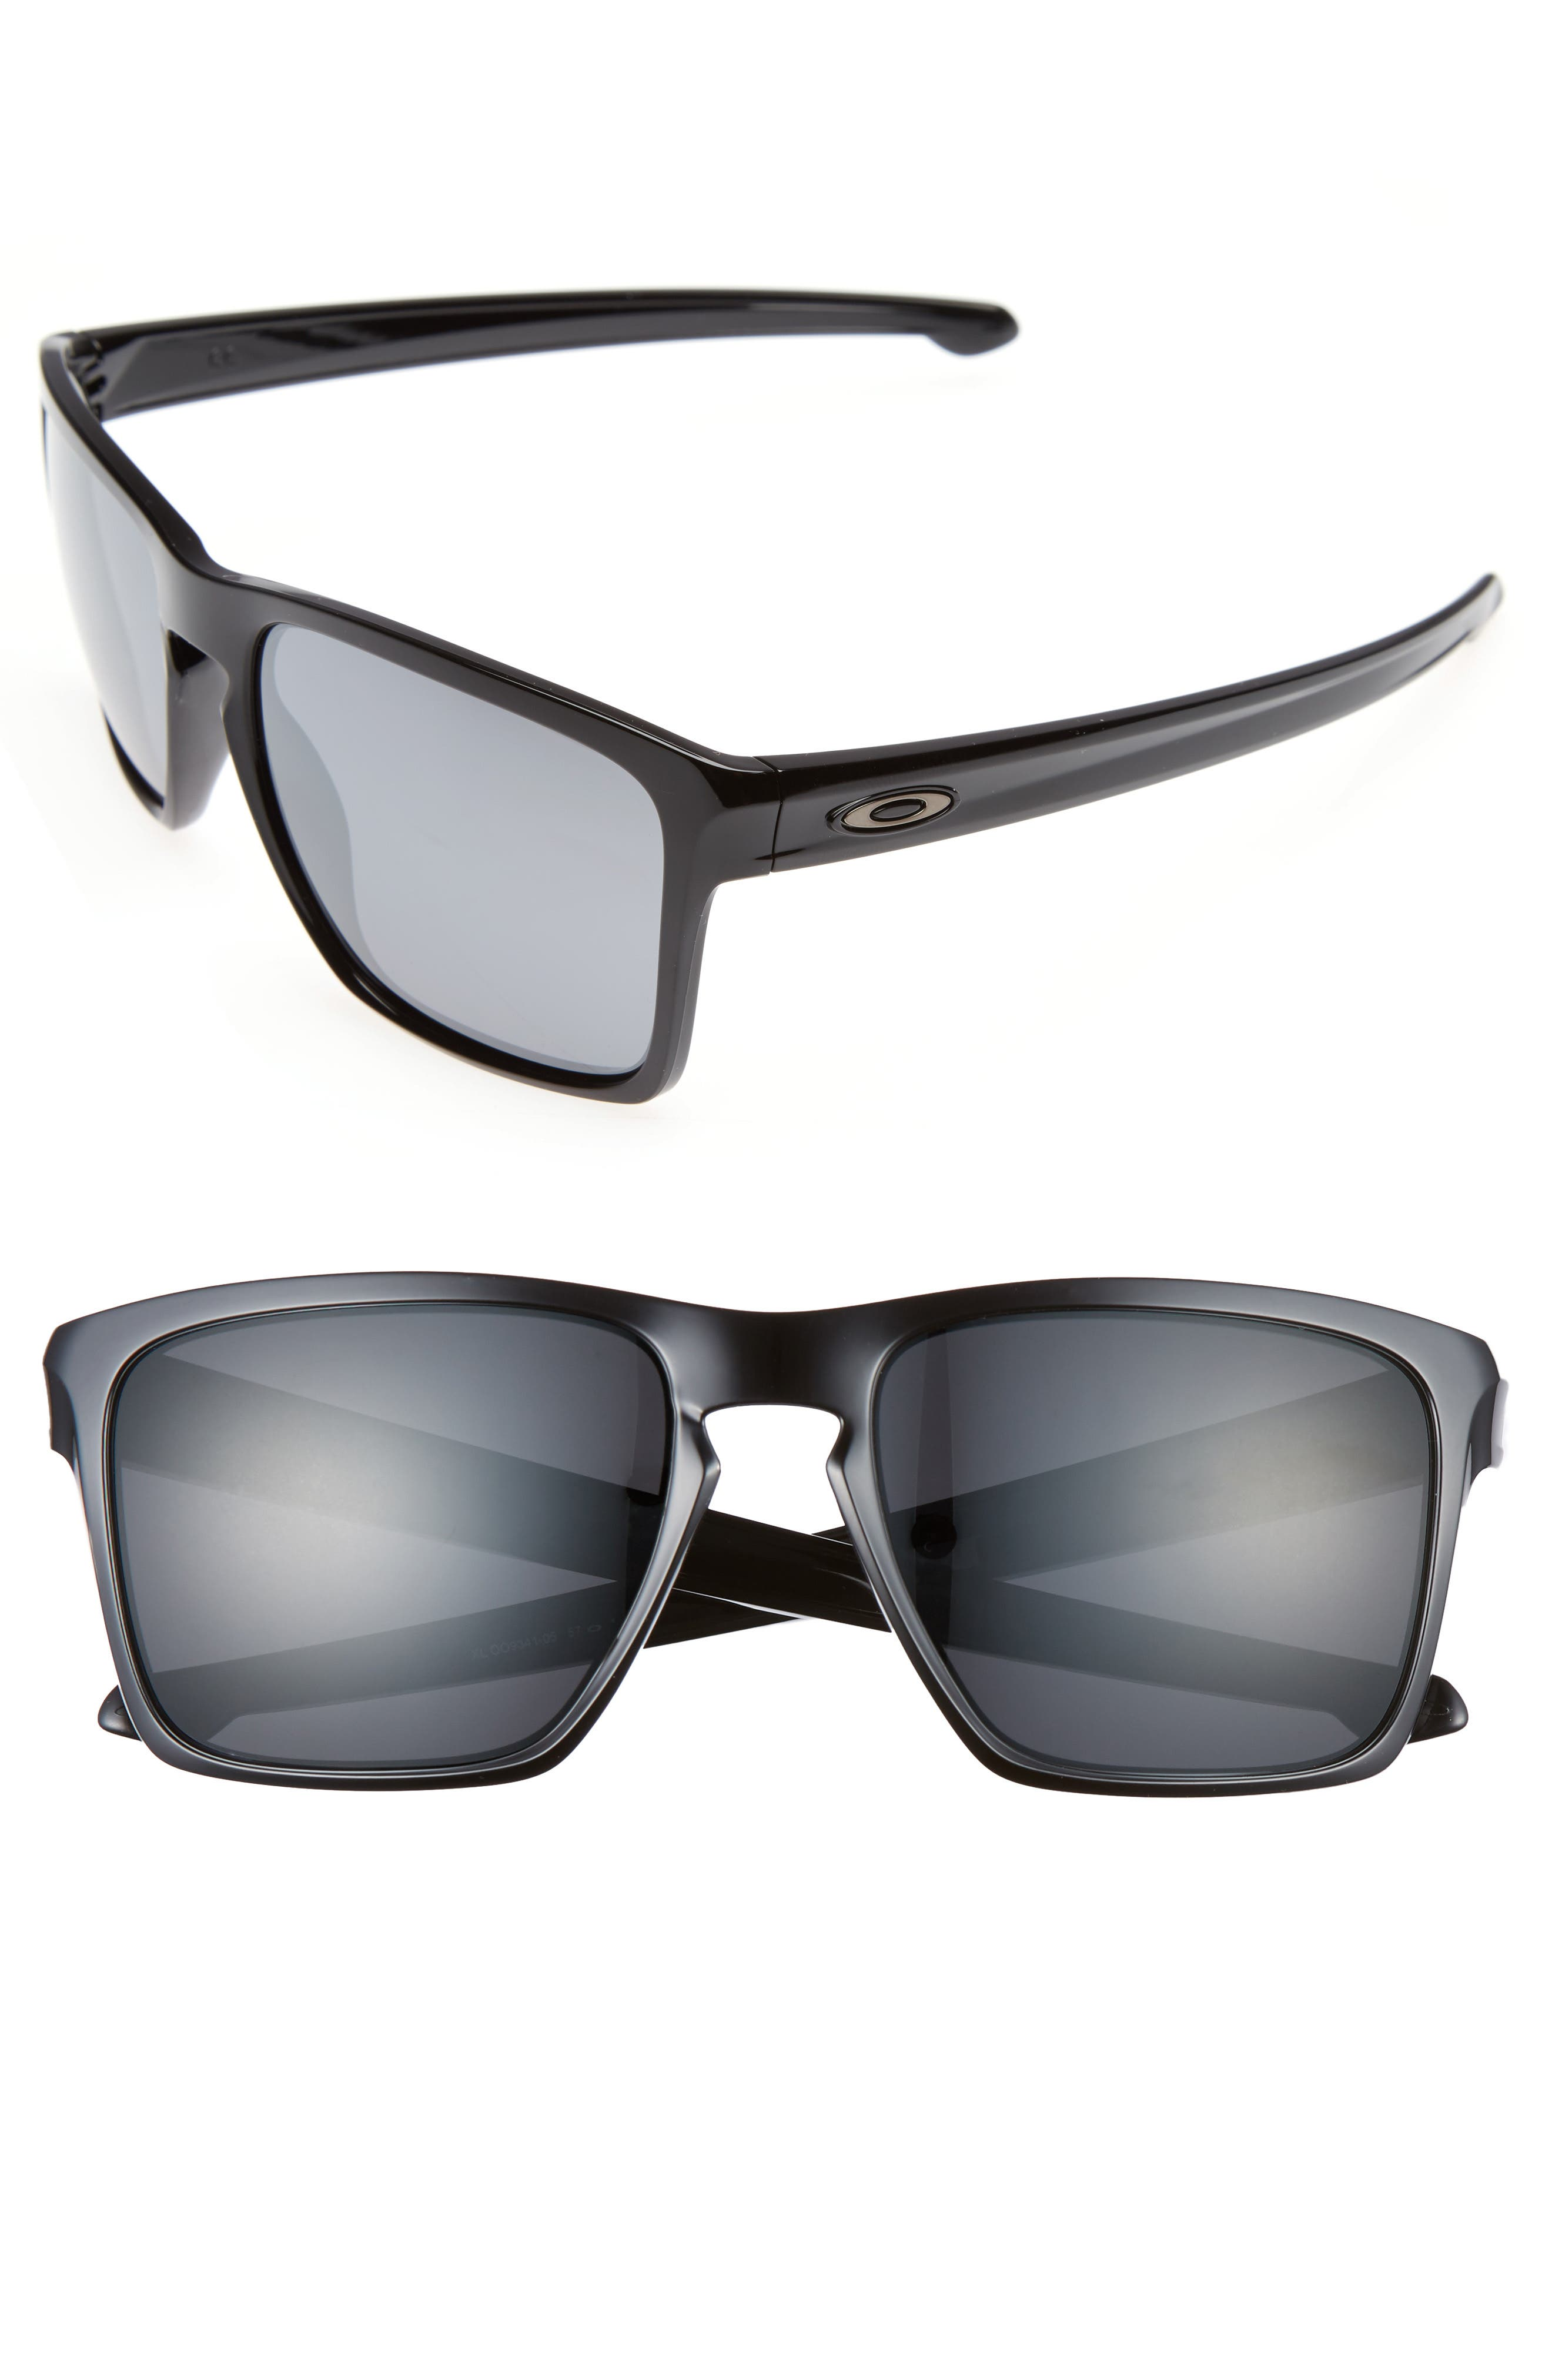 Oakley Silver Xl 57Mm Sunglasses - Black